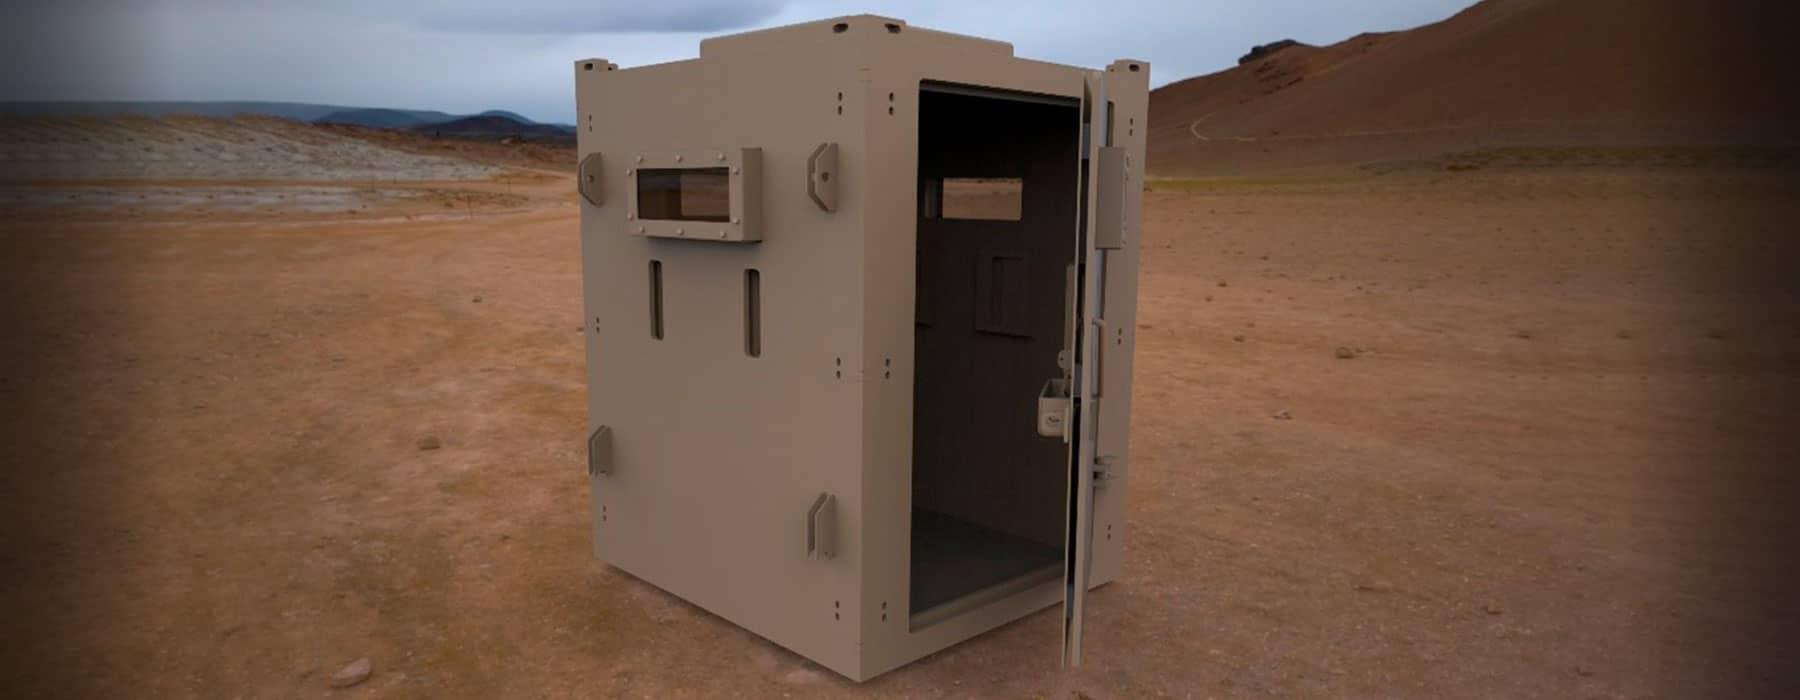 folio-mobile-guardhouse